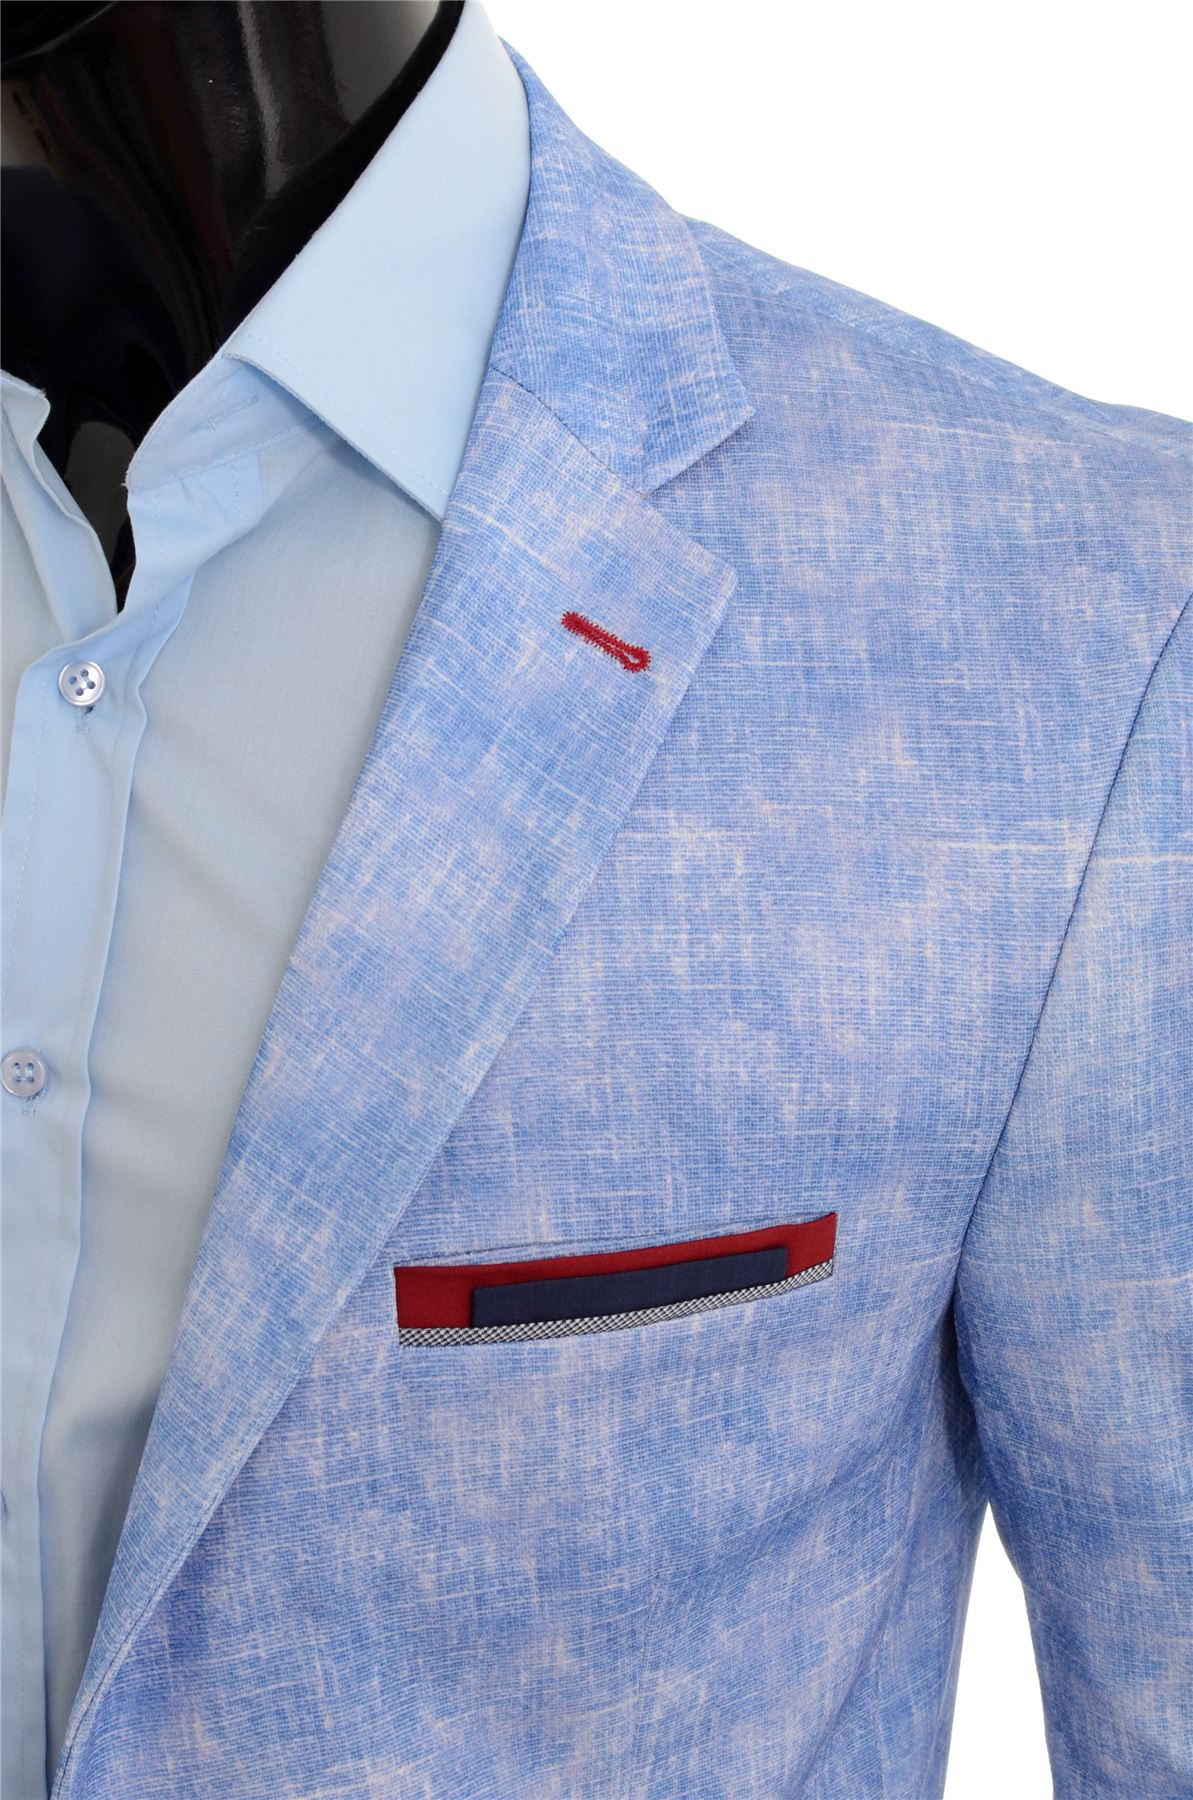 Men-039-s-Light-Blue-Blazer-Jacket-Casual-Smart-Slim-Fit-Summer-Red-Finish-Cotton thumbnail 5